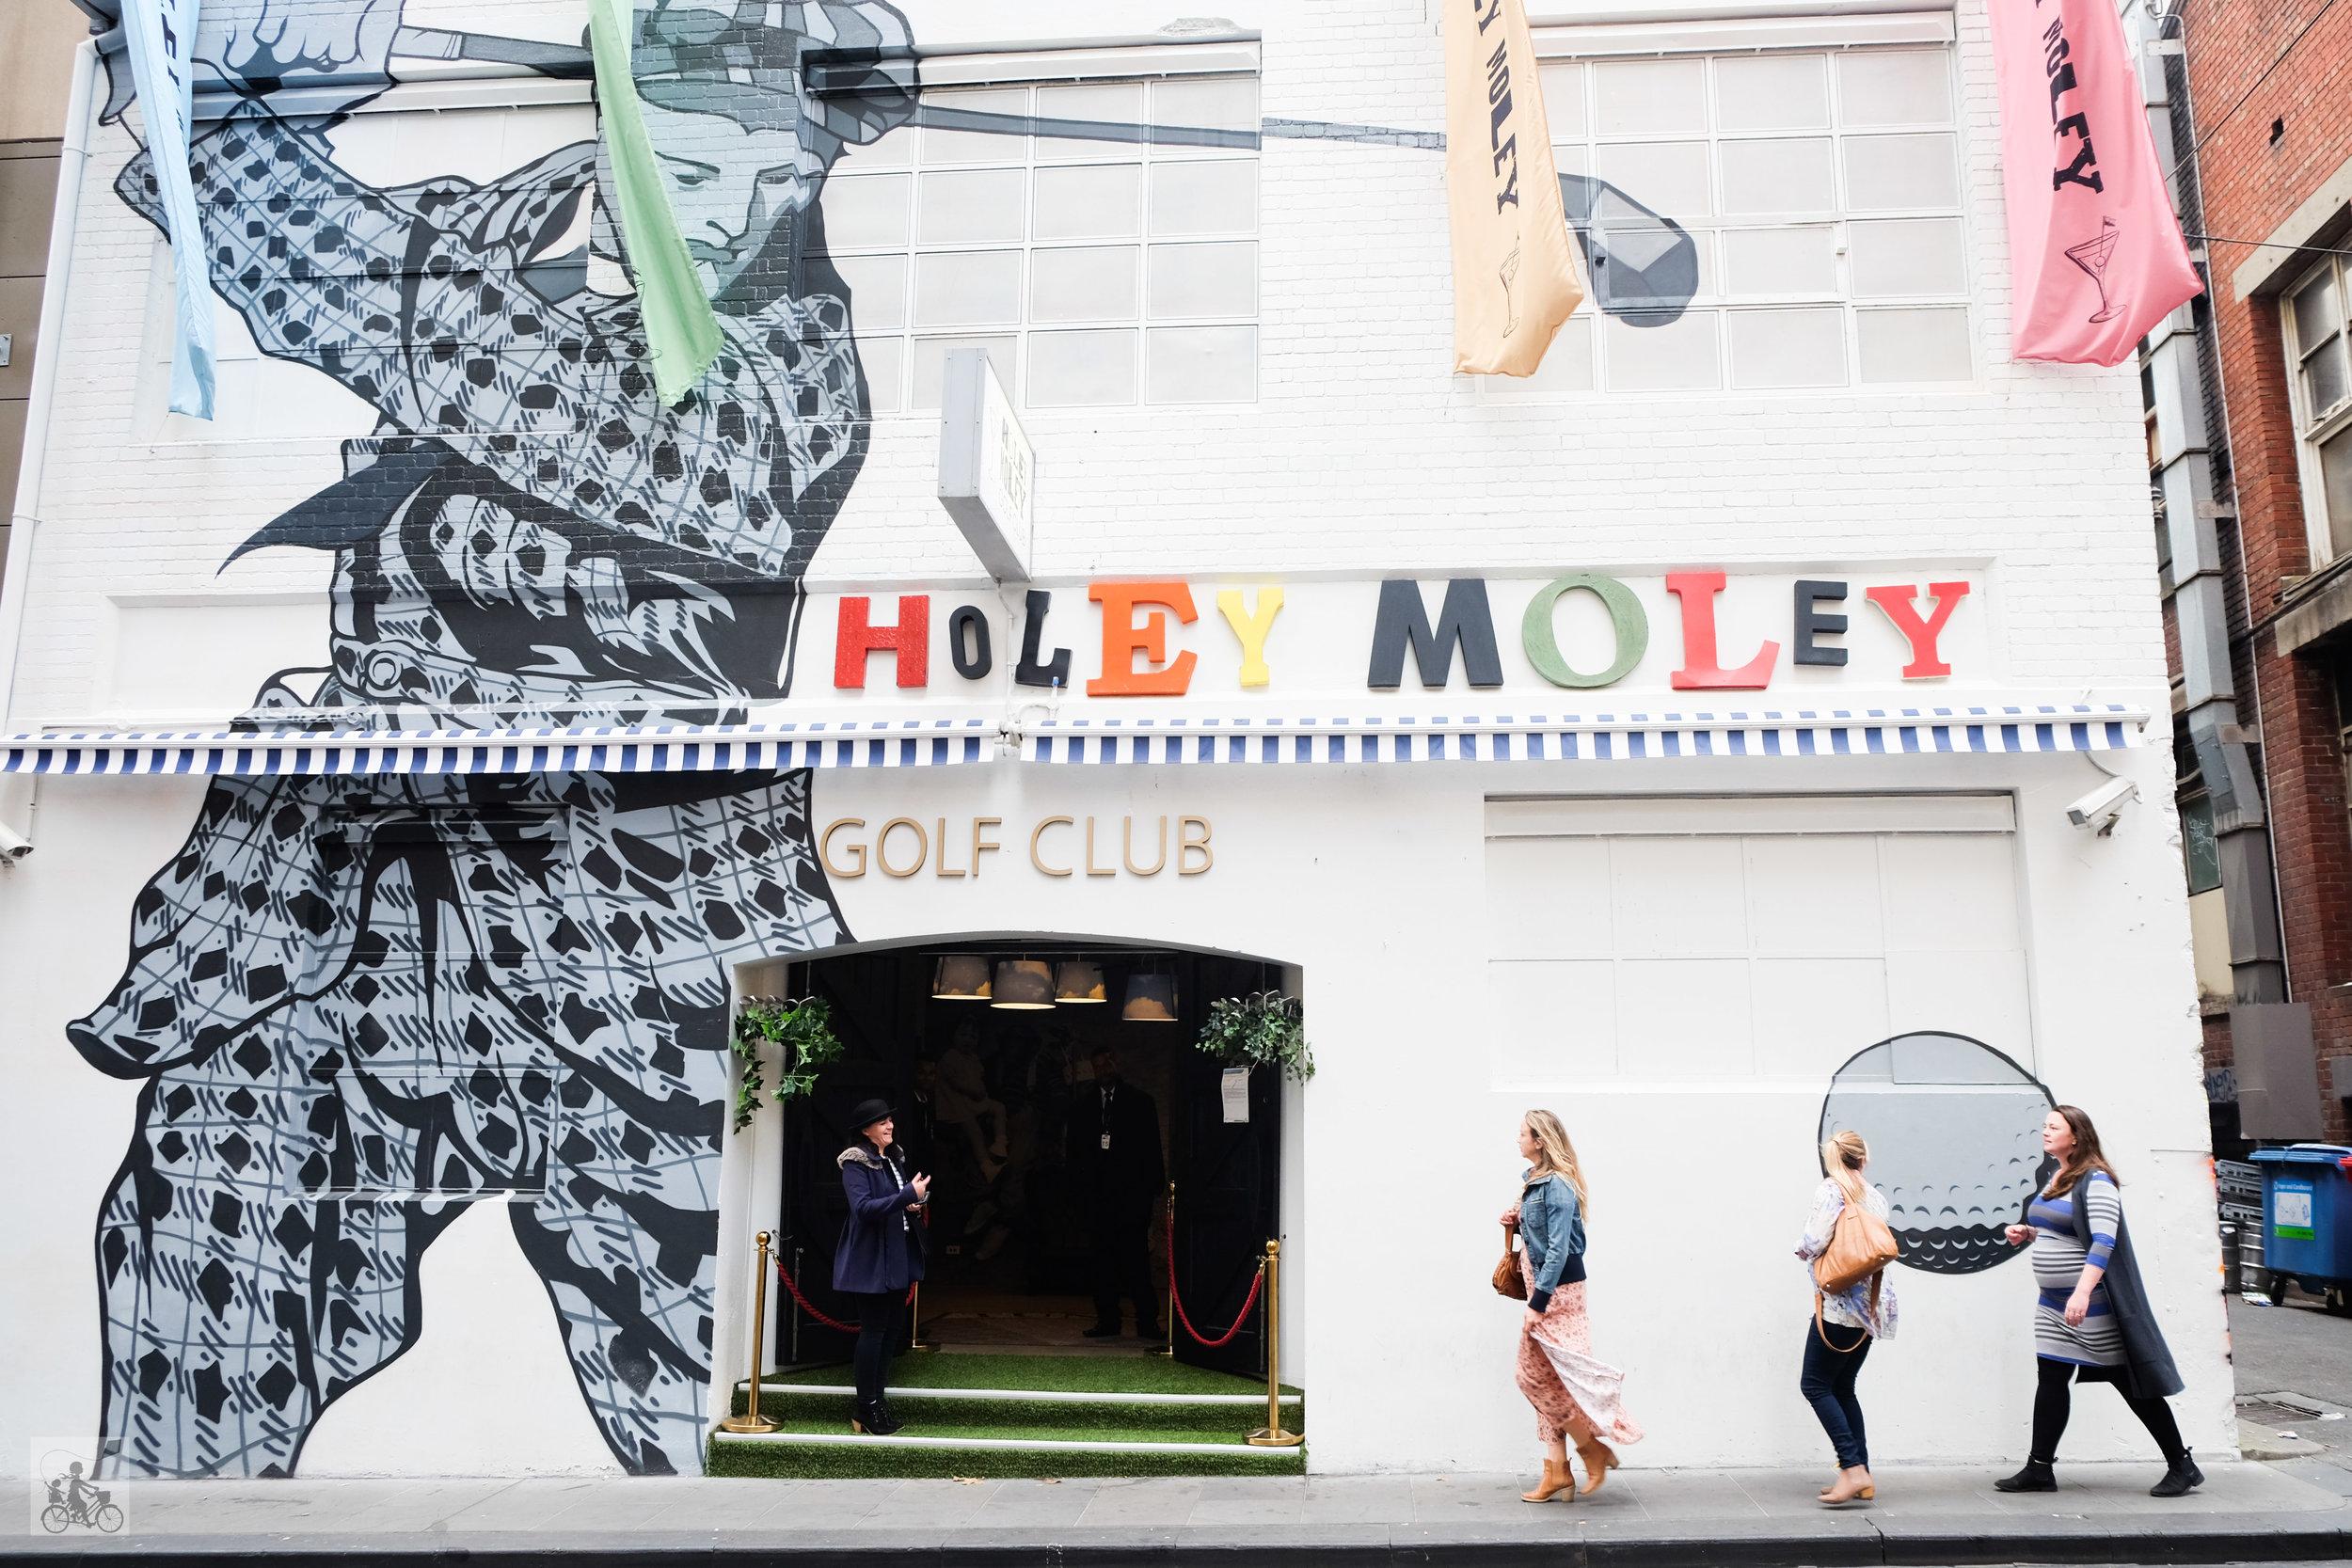 holey moley golf, melbourne - mamma knows melbourne